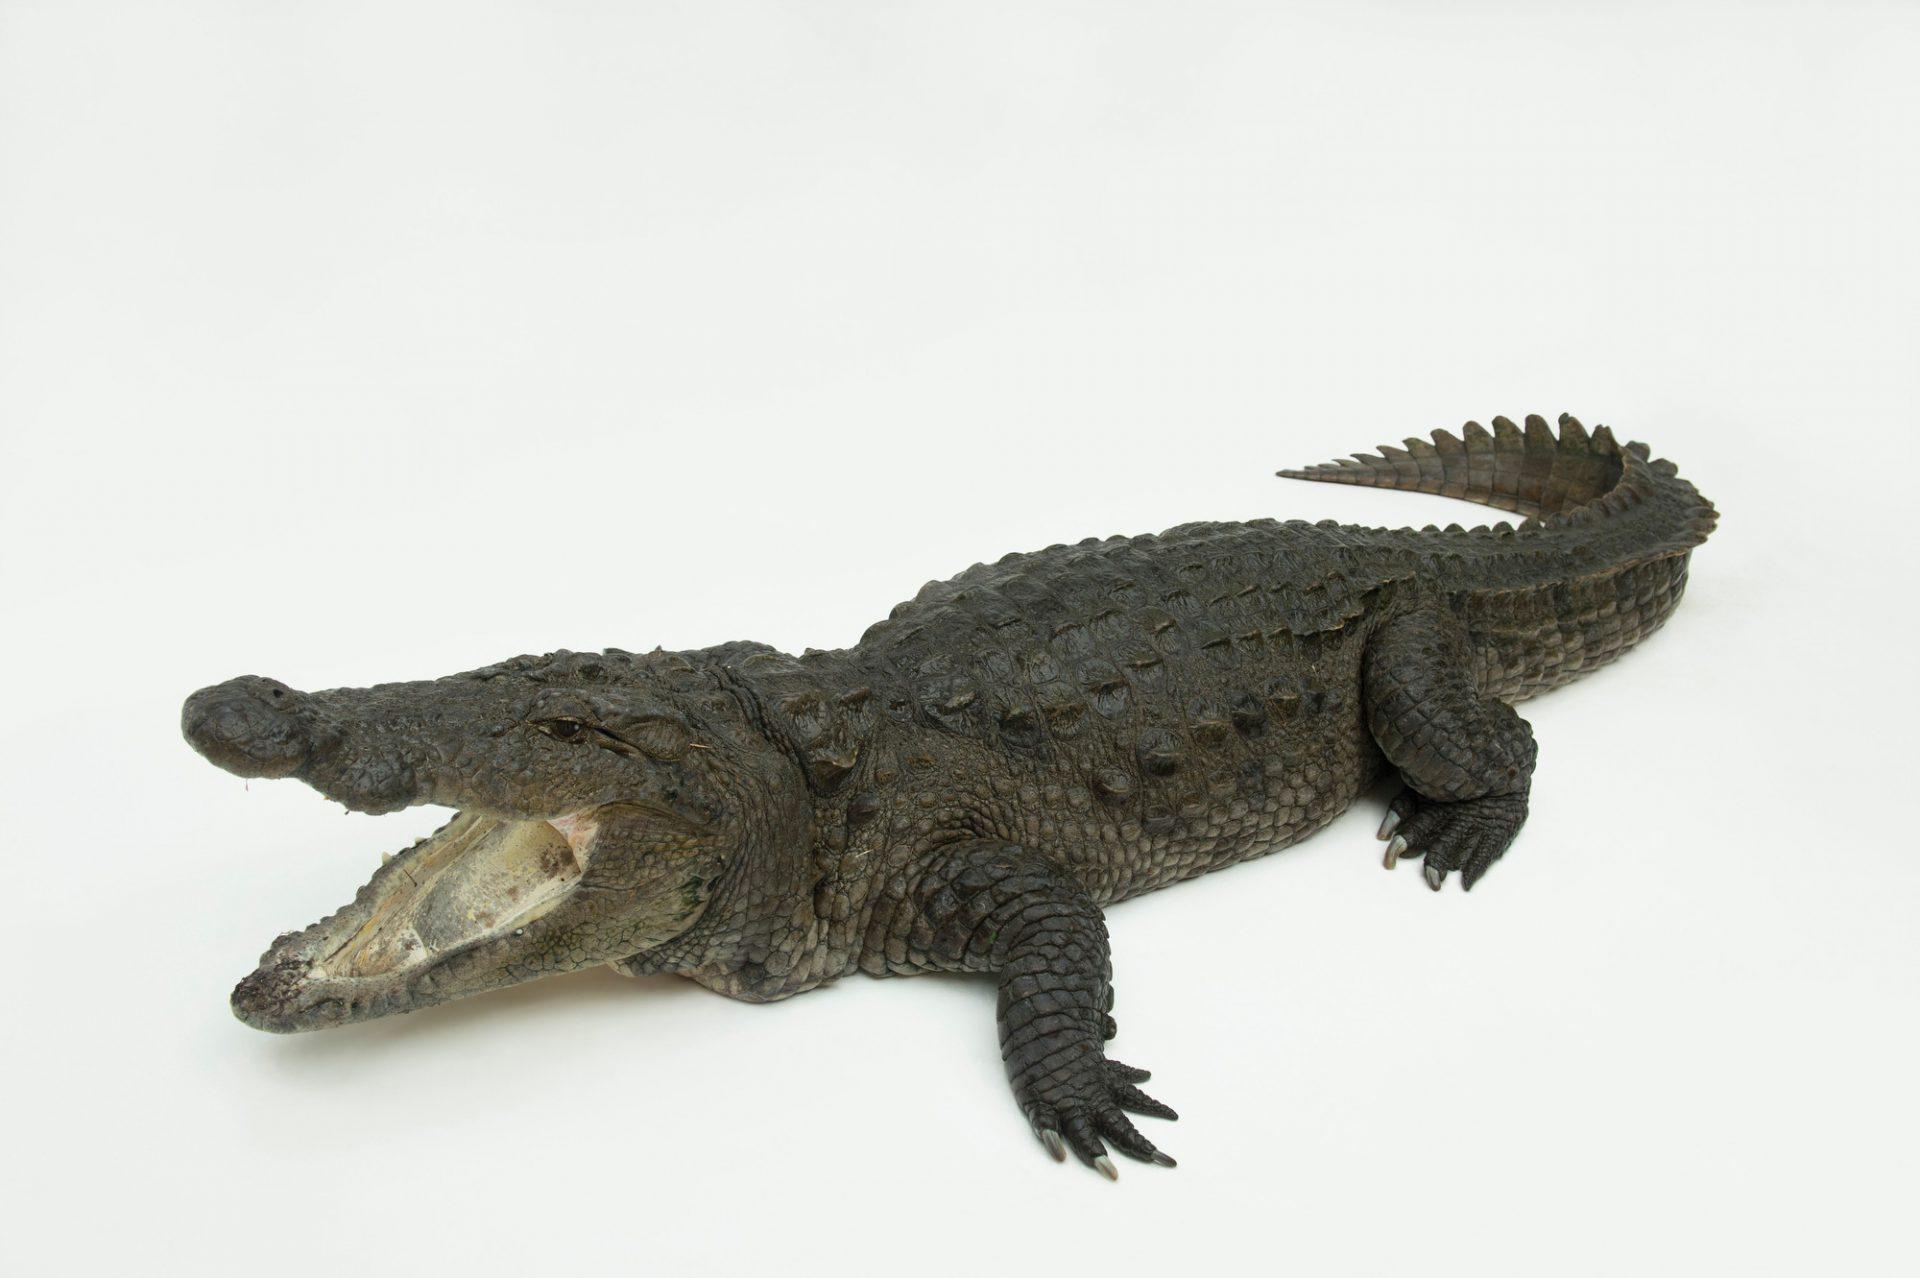 Picture of a vulnerable mugger crocodile (Crocodylus palustris) at the St. Augustine Alligator Farm.